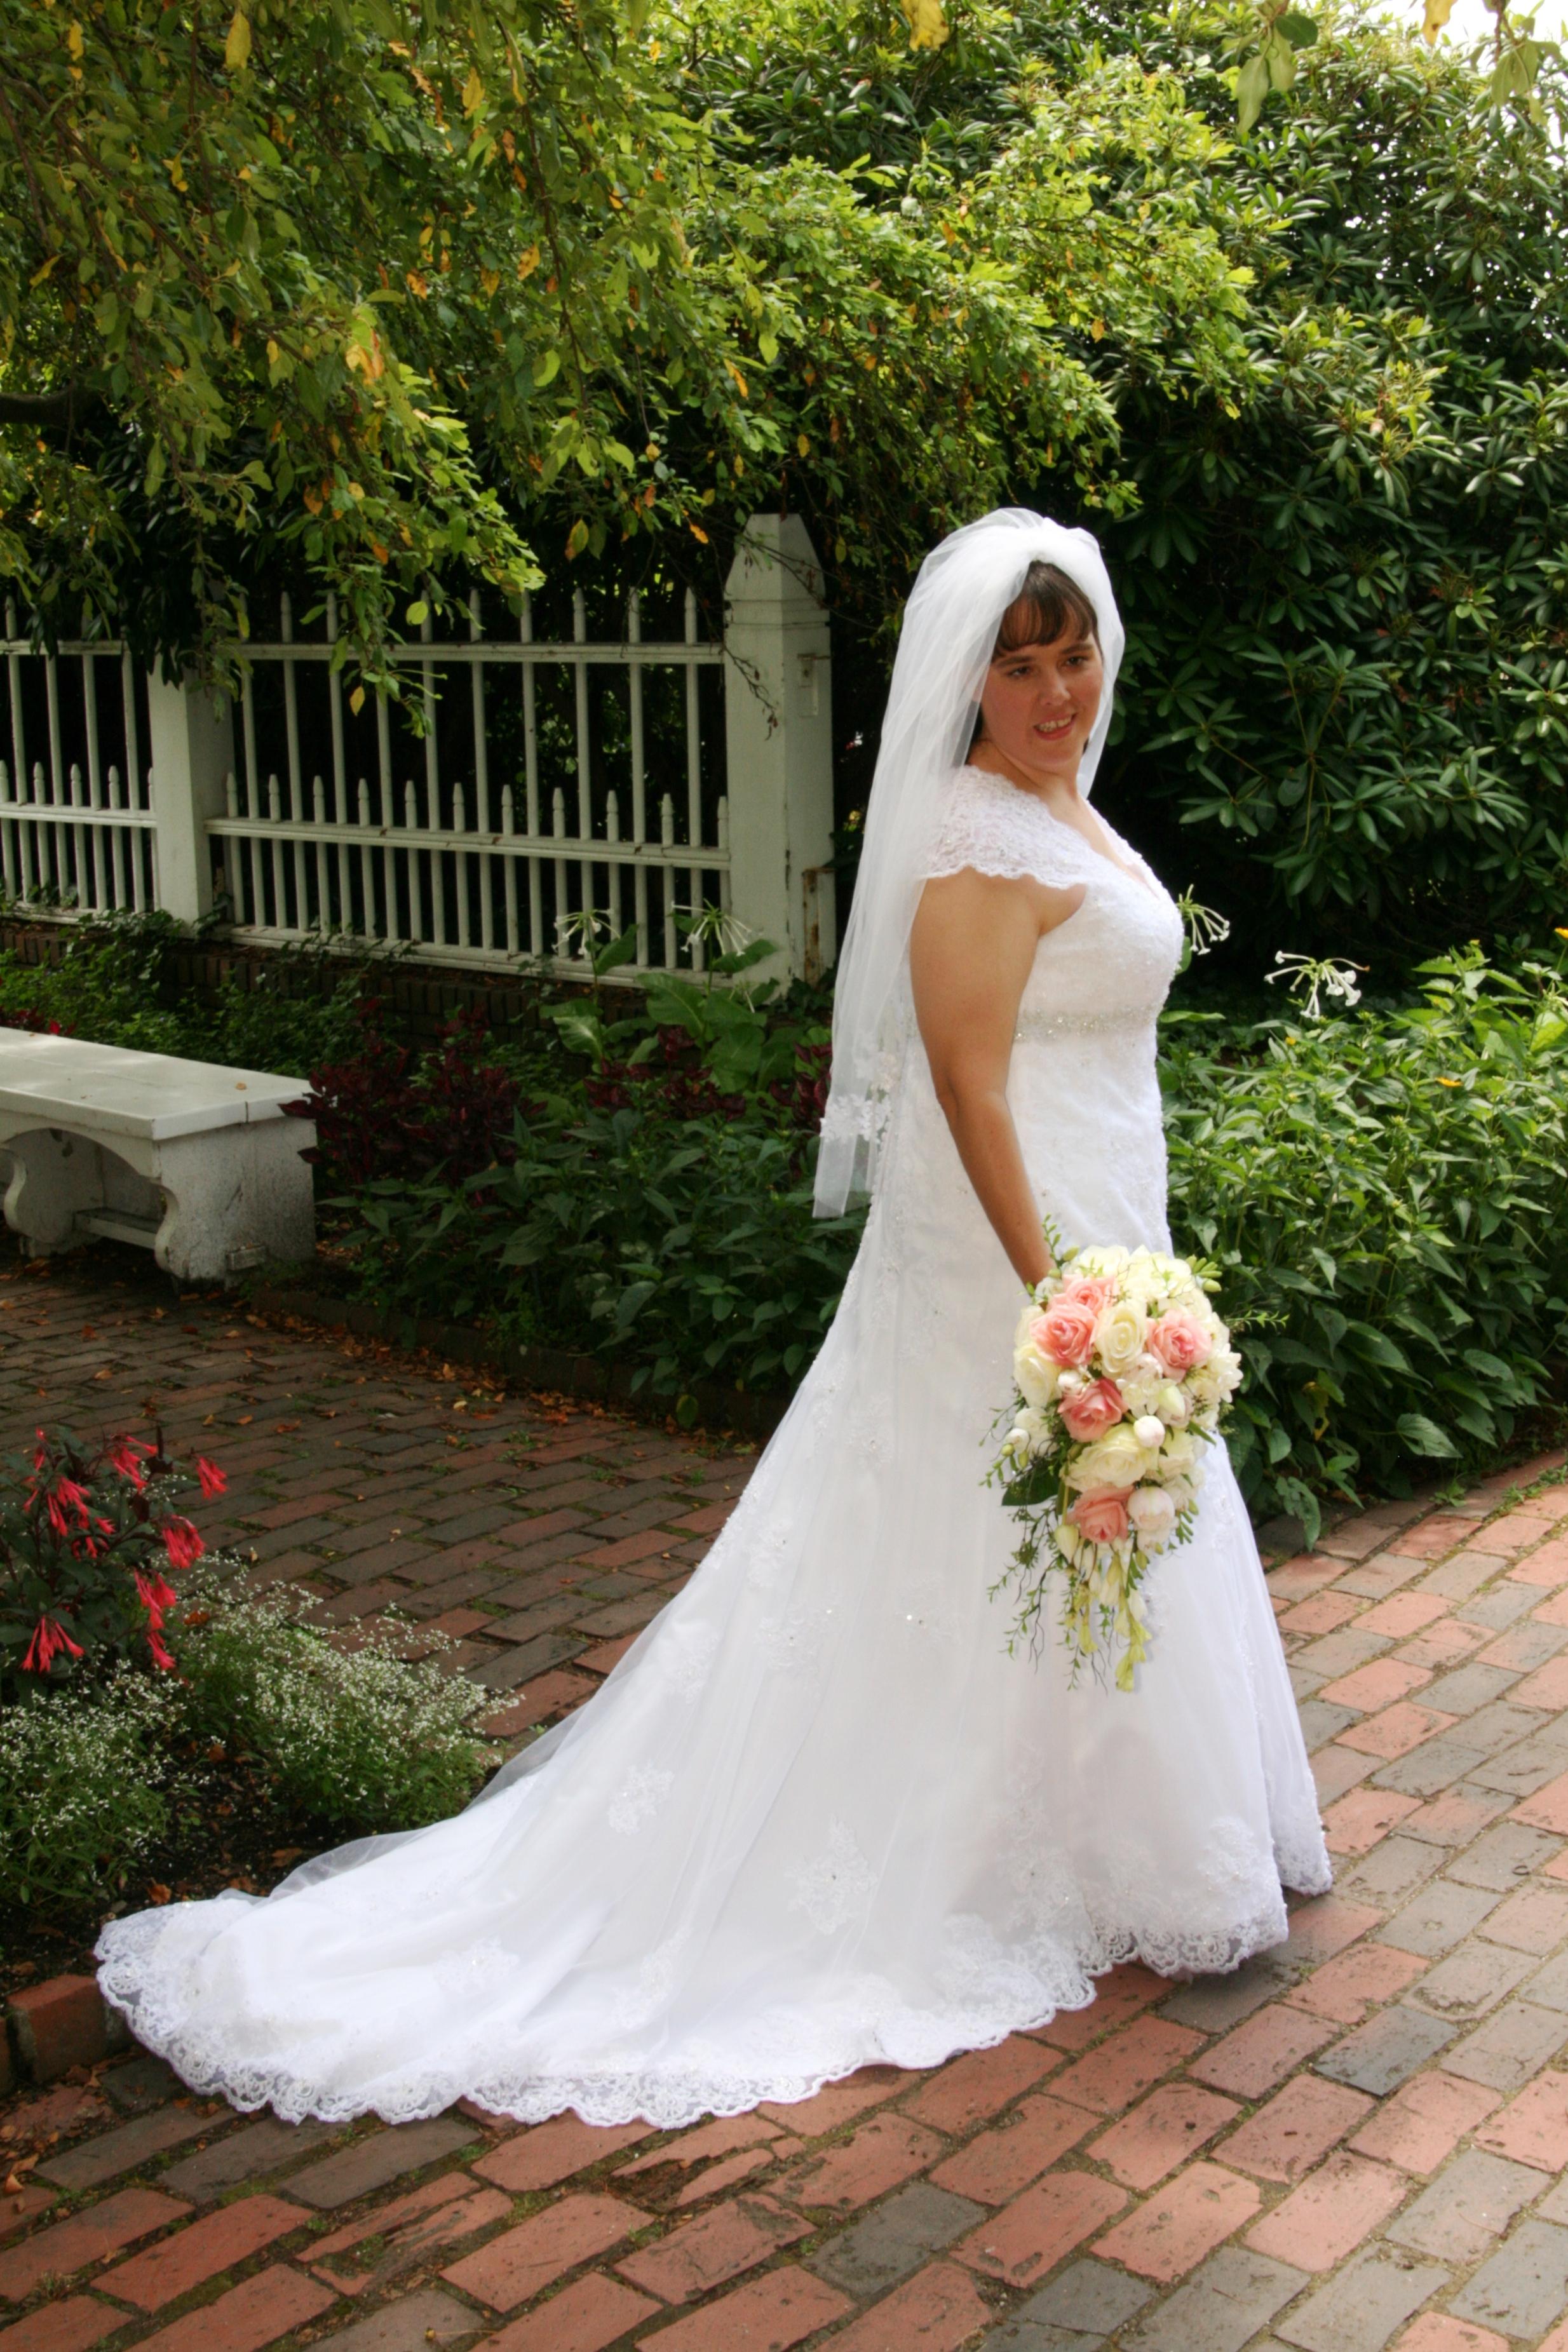 wedding dresses portsmouth nh photo - 1